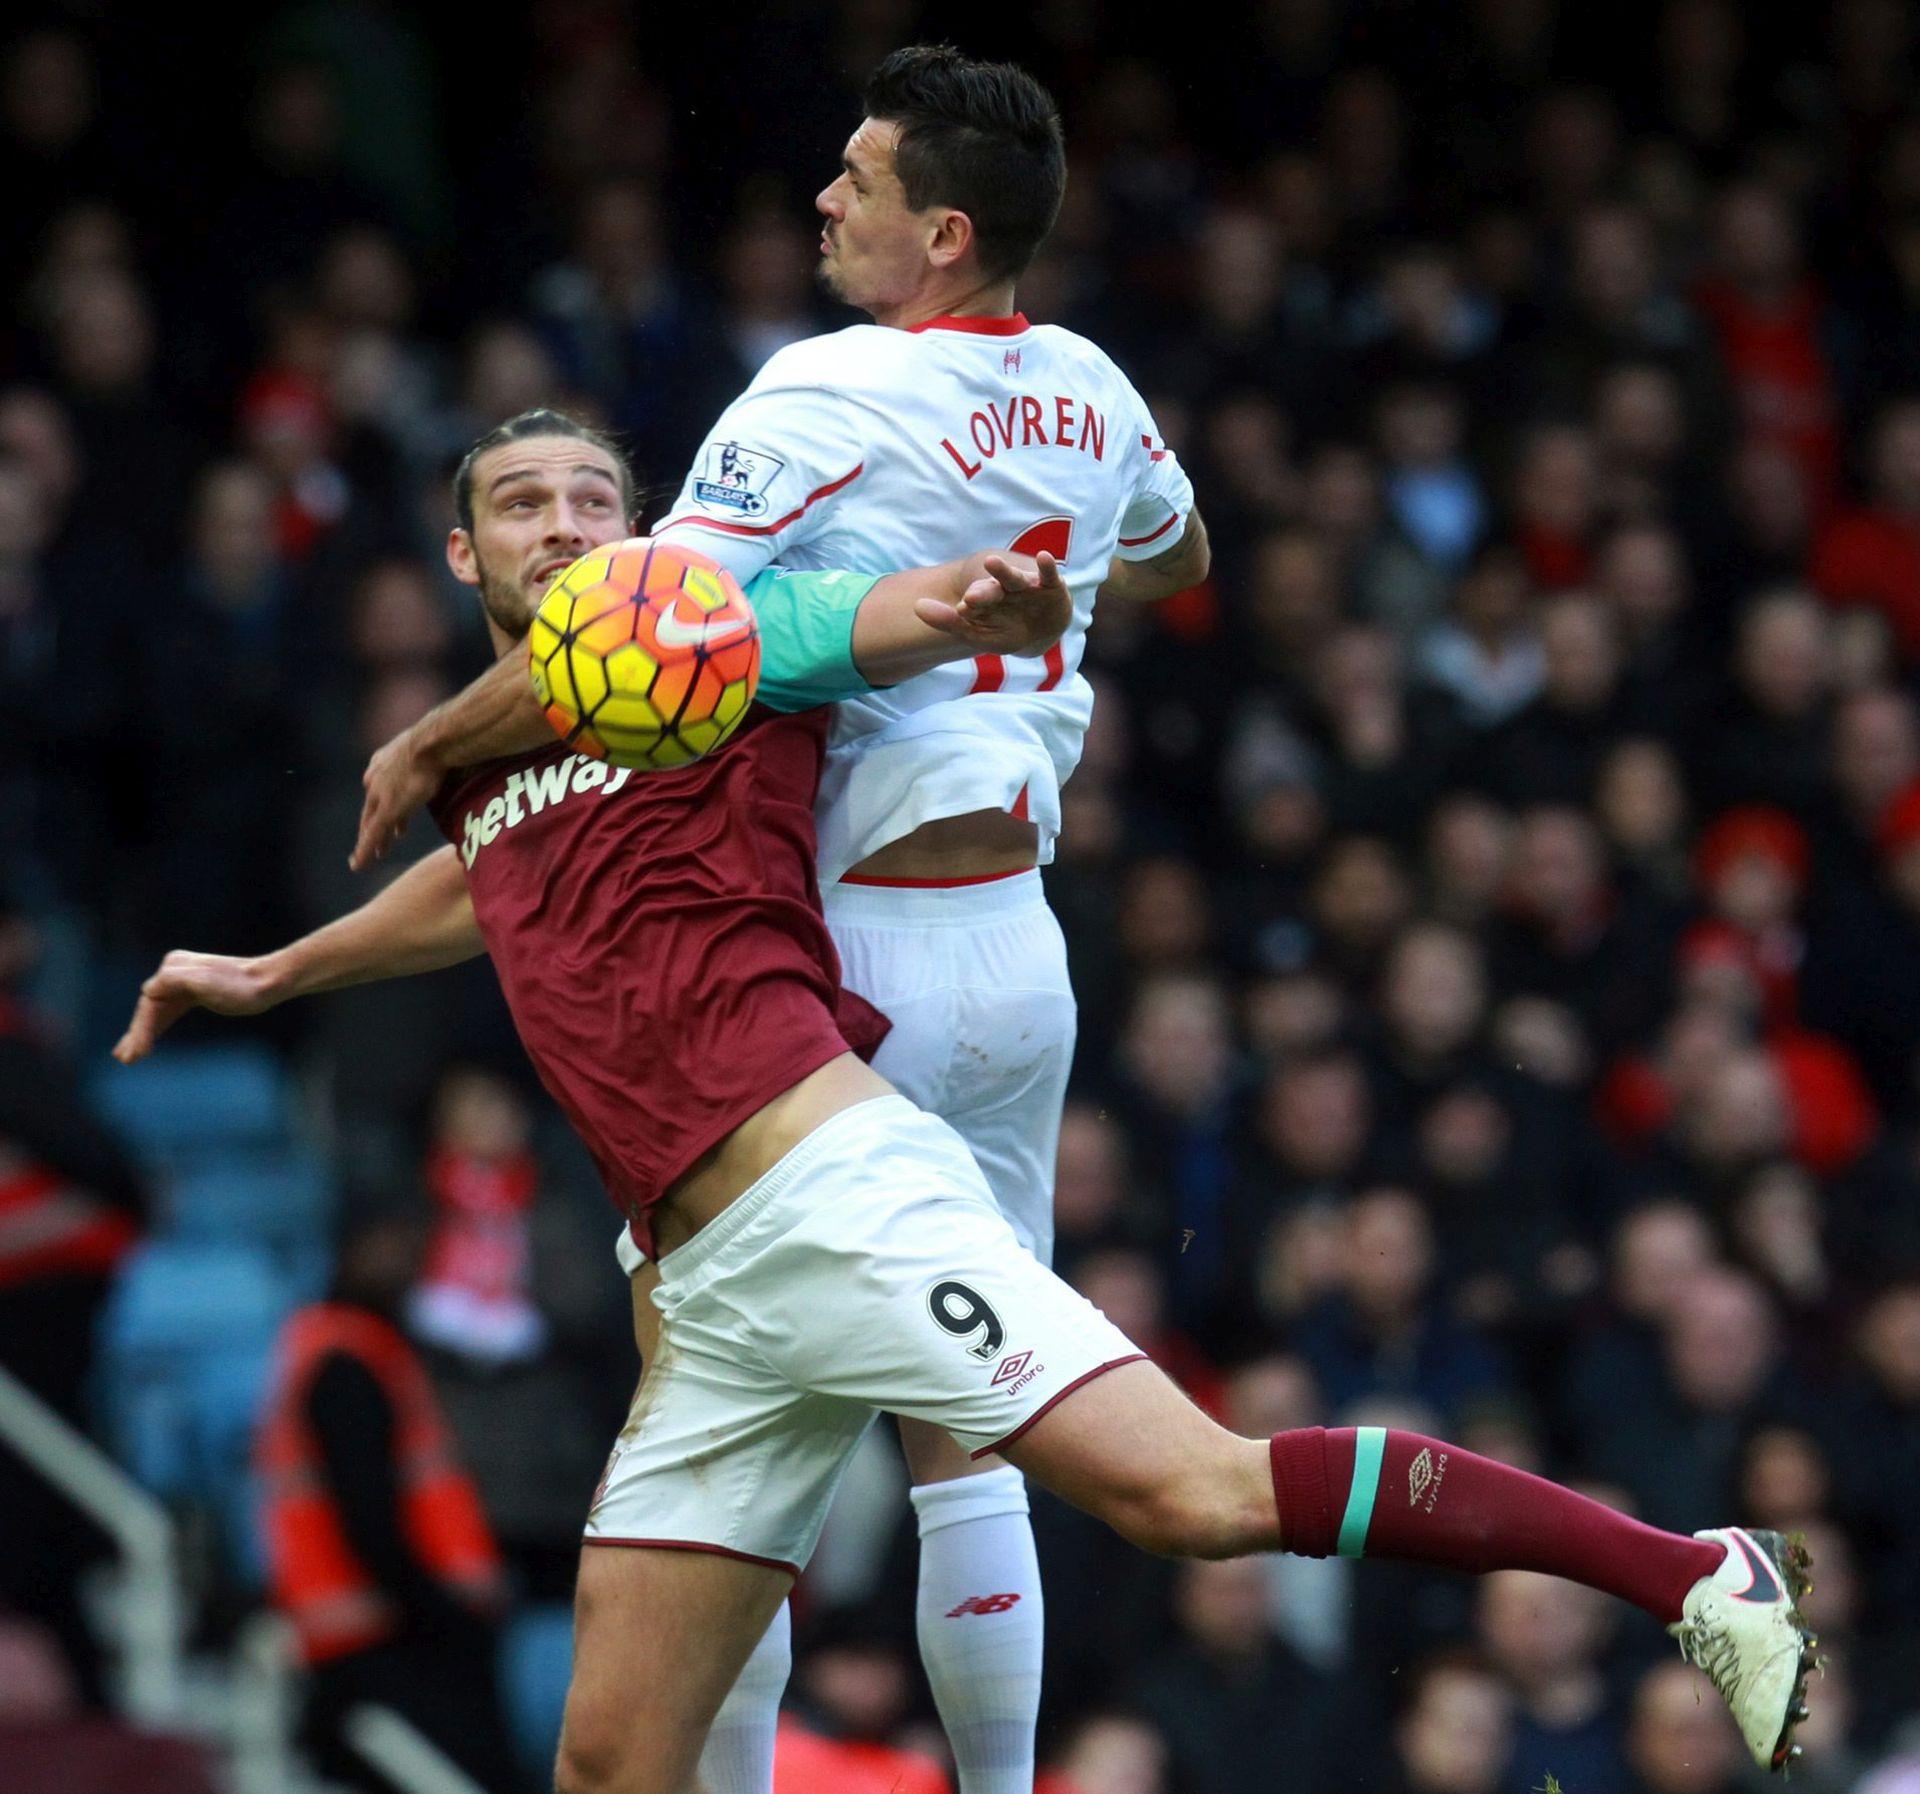 Trener West Hama potjerao s treninga Andyja Carrolla